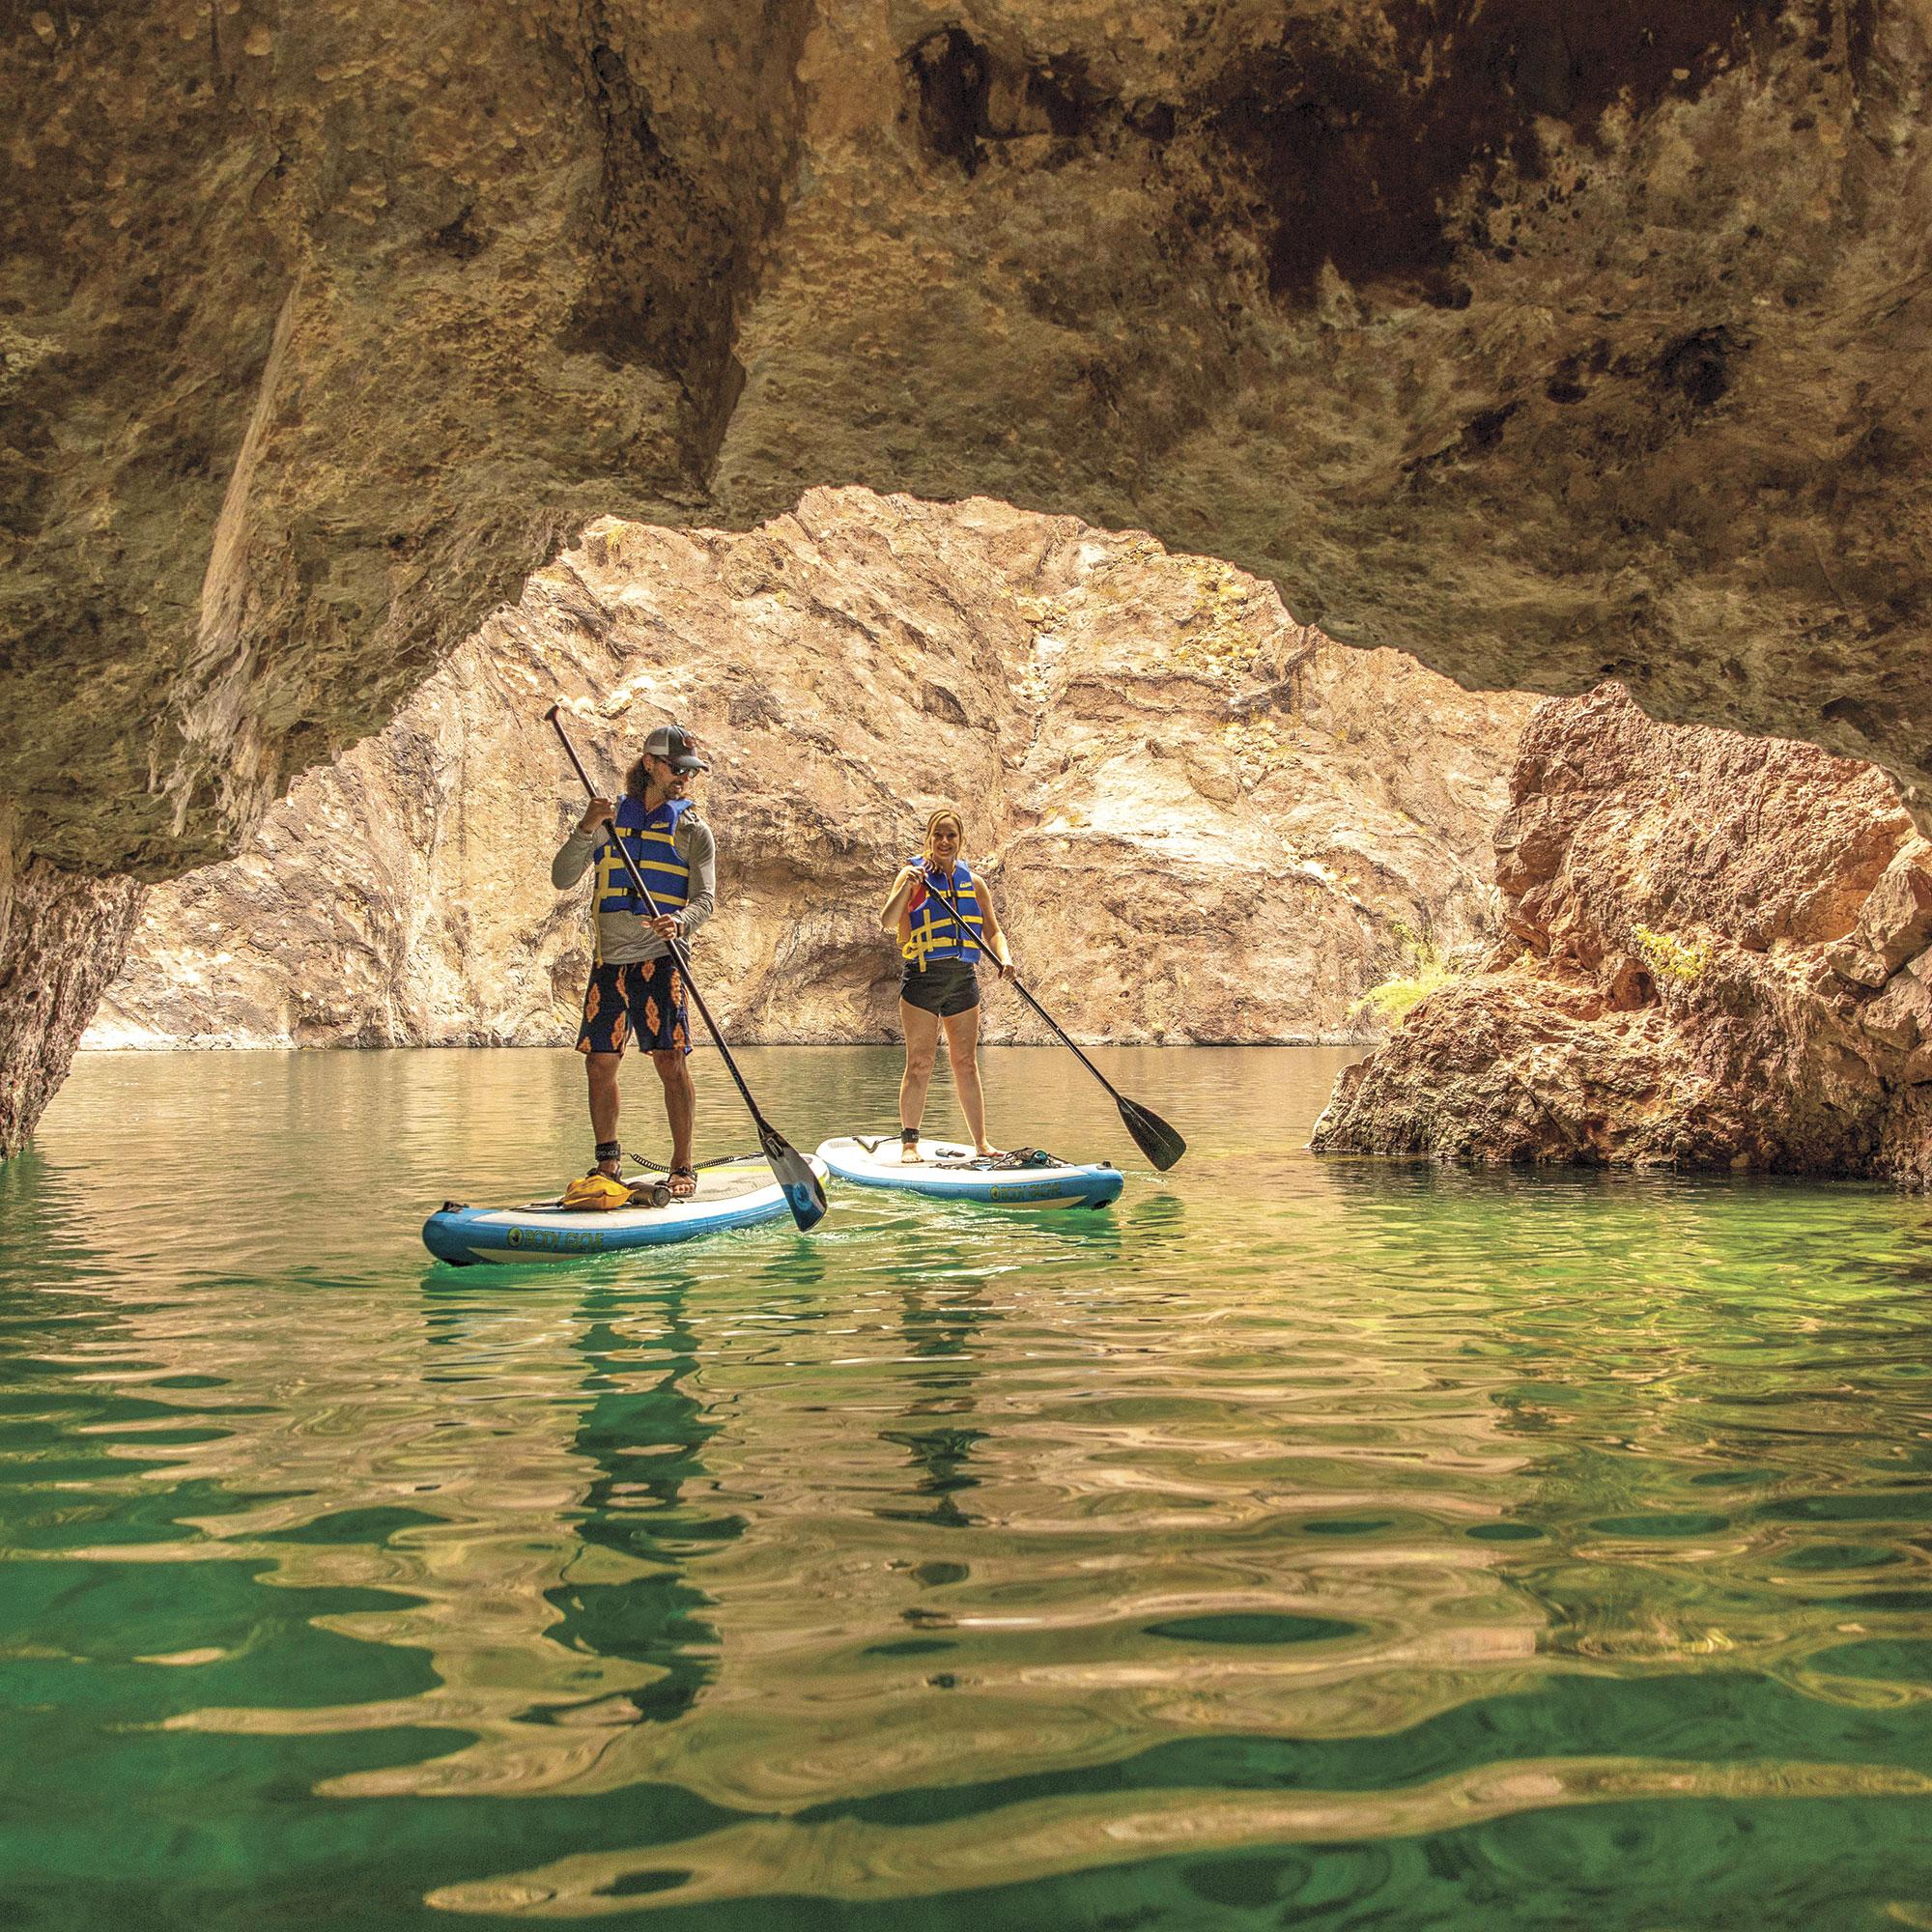 paddleboarding inside and around Emerald Cove; Photo by Kevin Kaminski; Models: Kelly Kaminski & Nick Tortajada